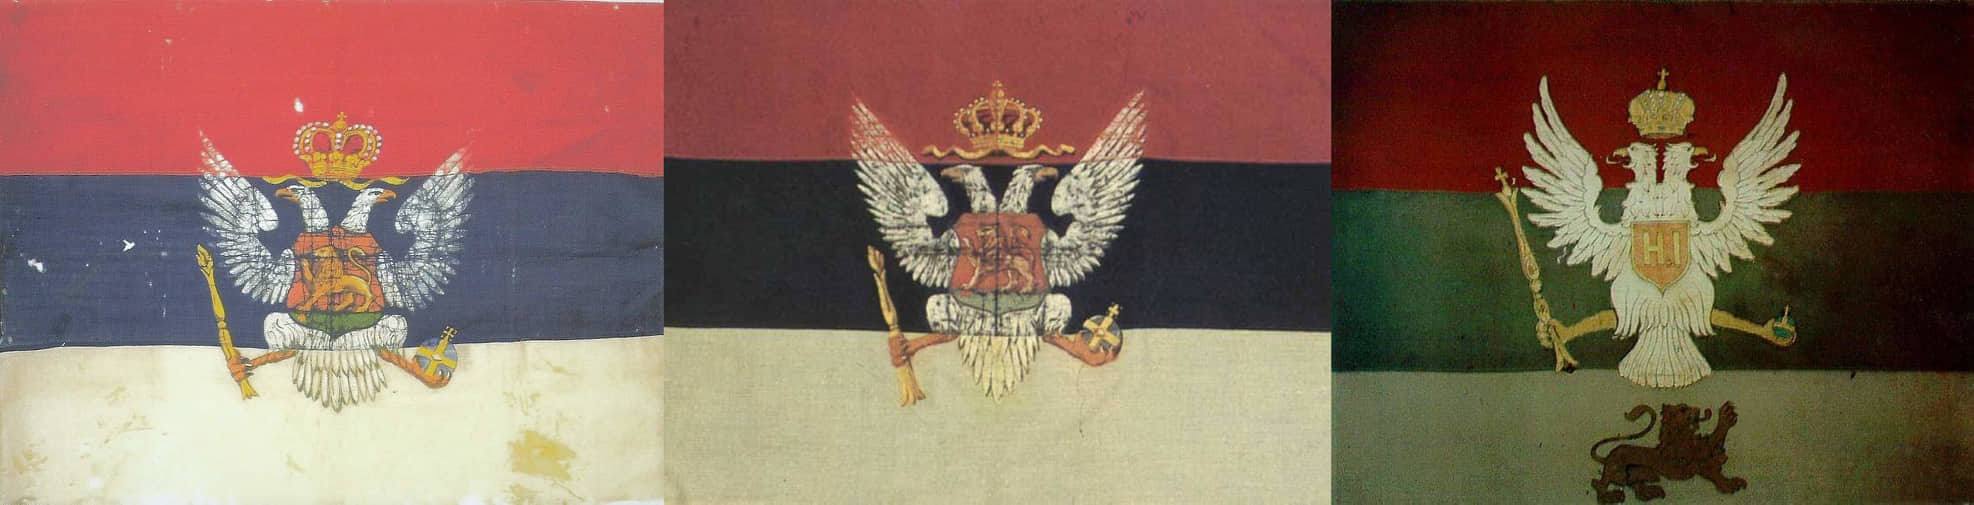 Zastave Knjaževine i Kraljevine Crne Gore